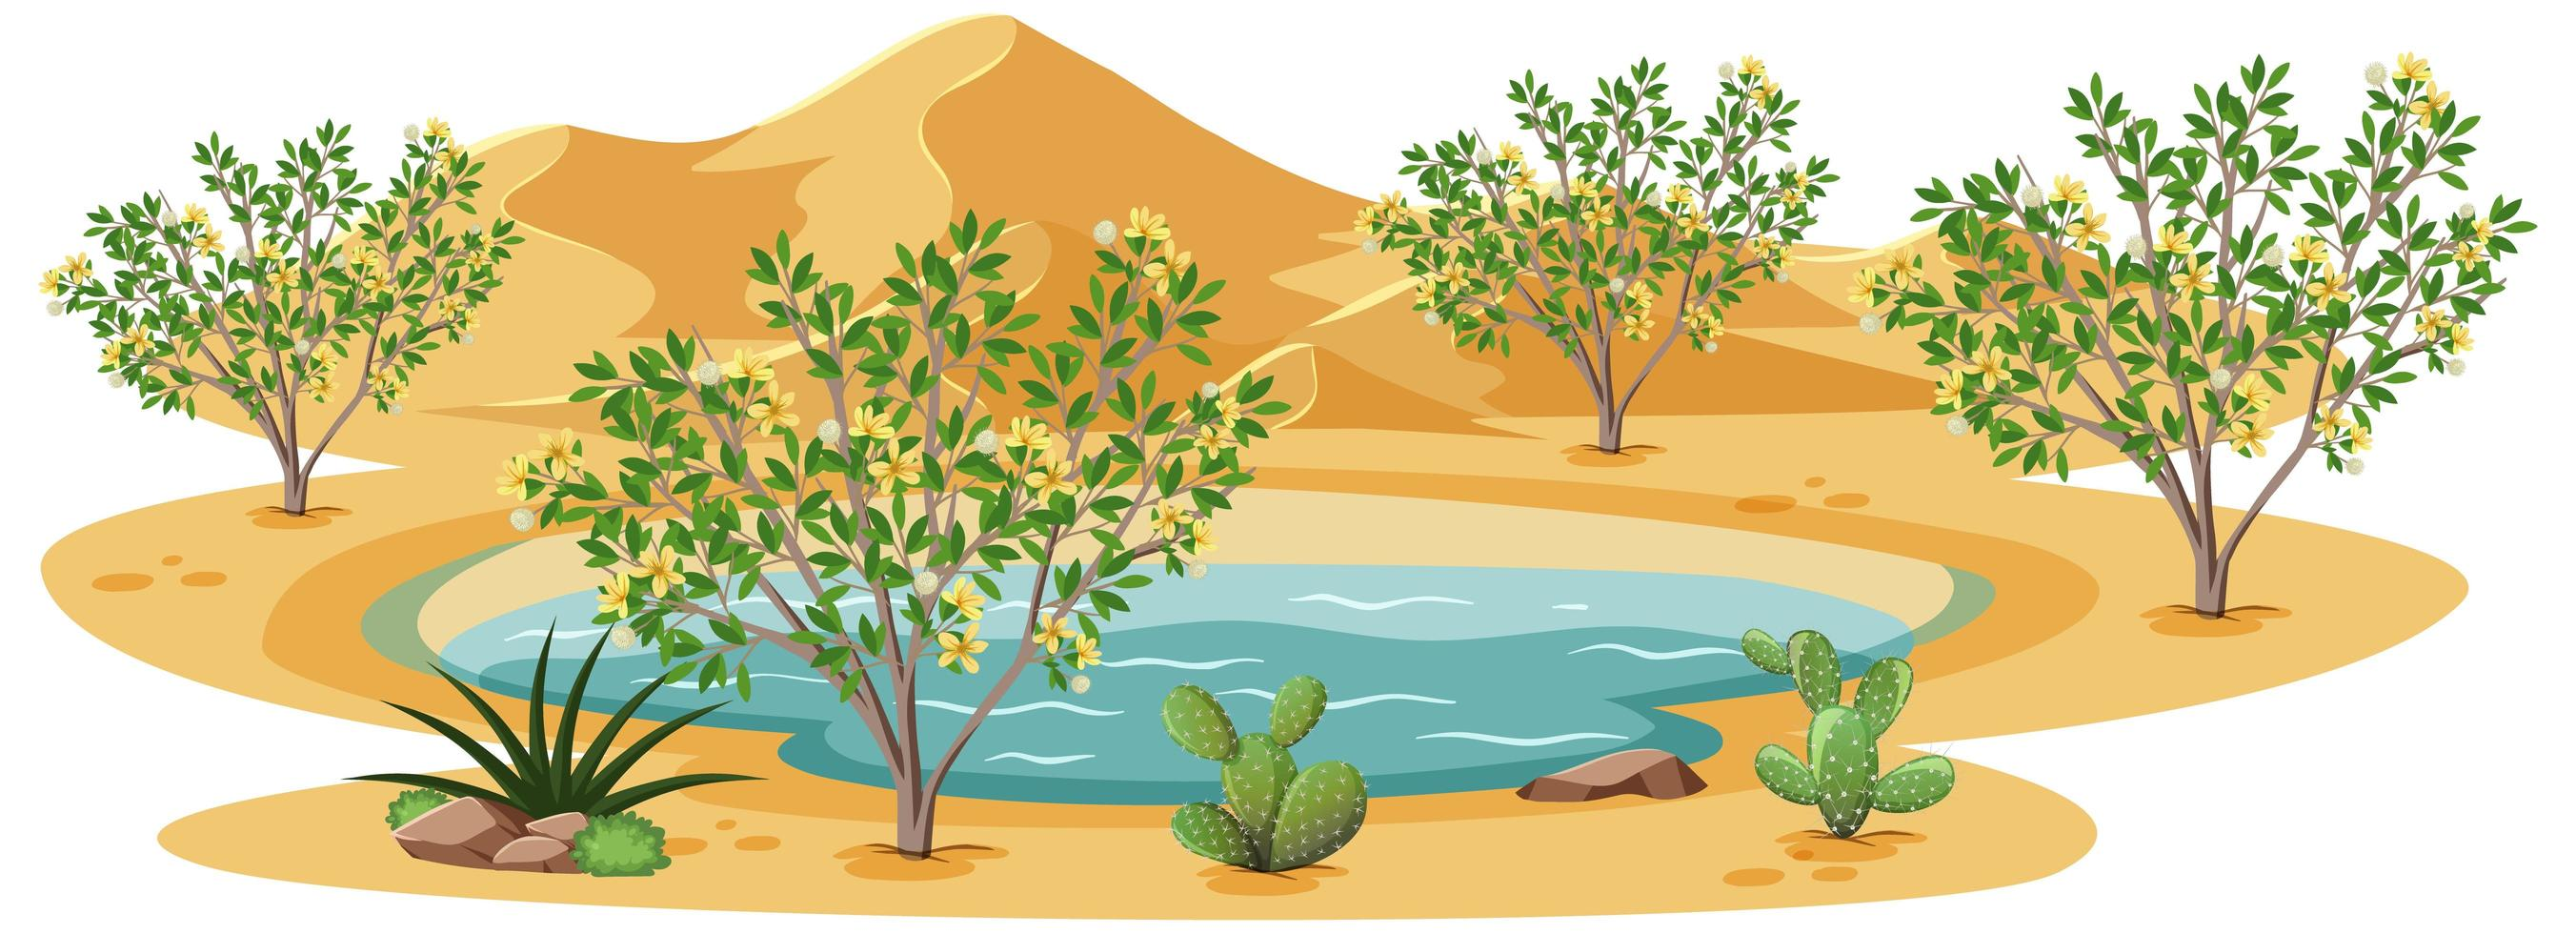 kreosot buskeväxt i vild öken på vit bakgrund vektor